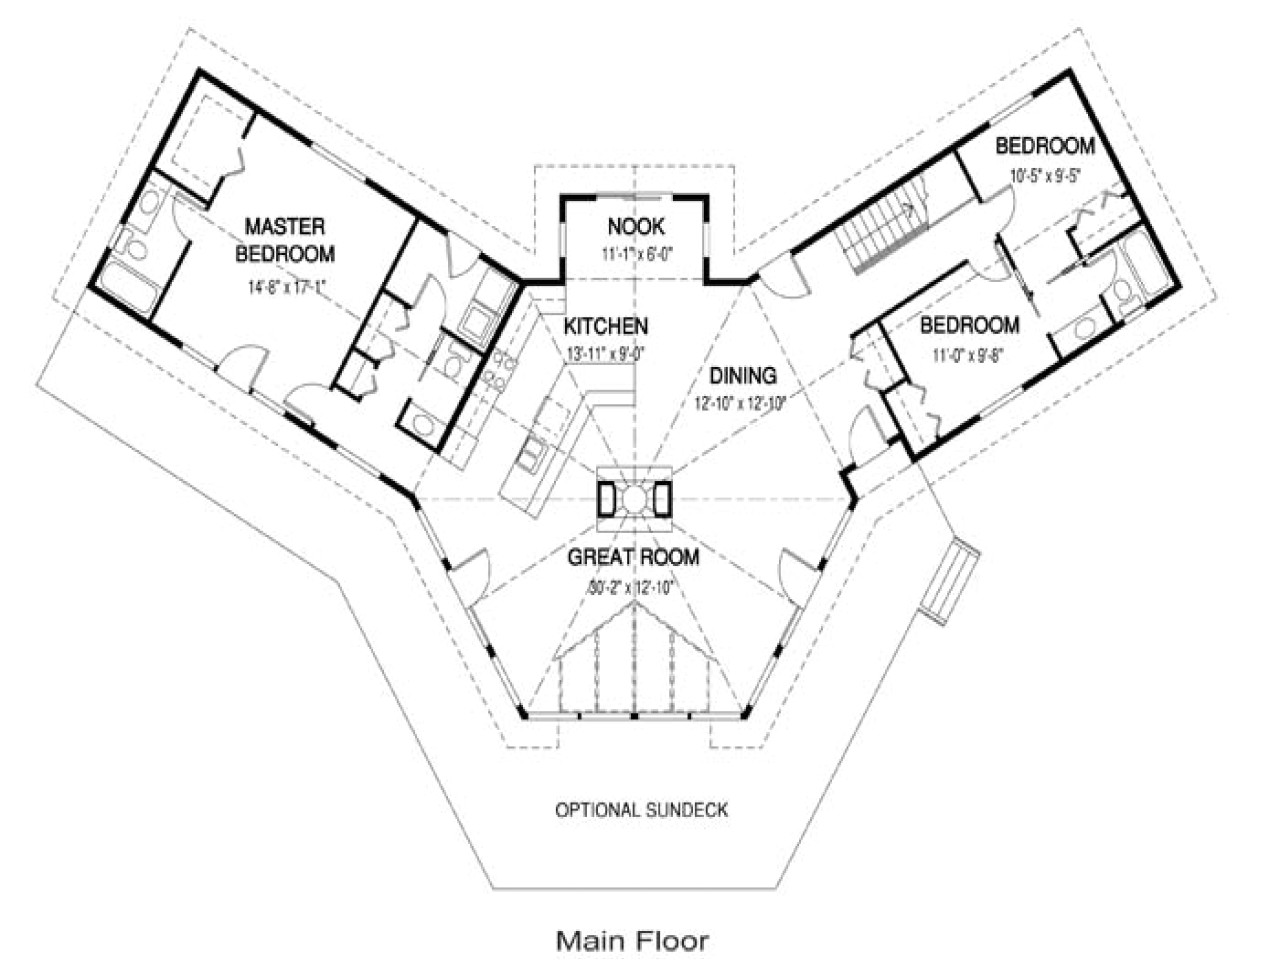 e84fa8f985b03de7 simple small open floor plans small open concept house floor plans